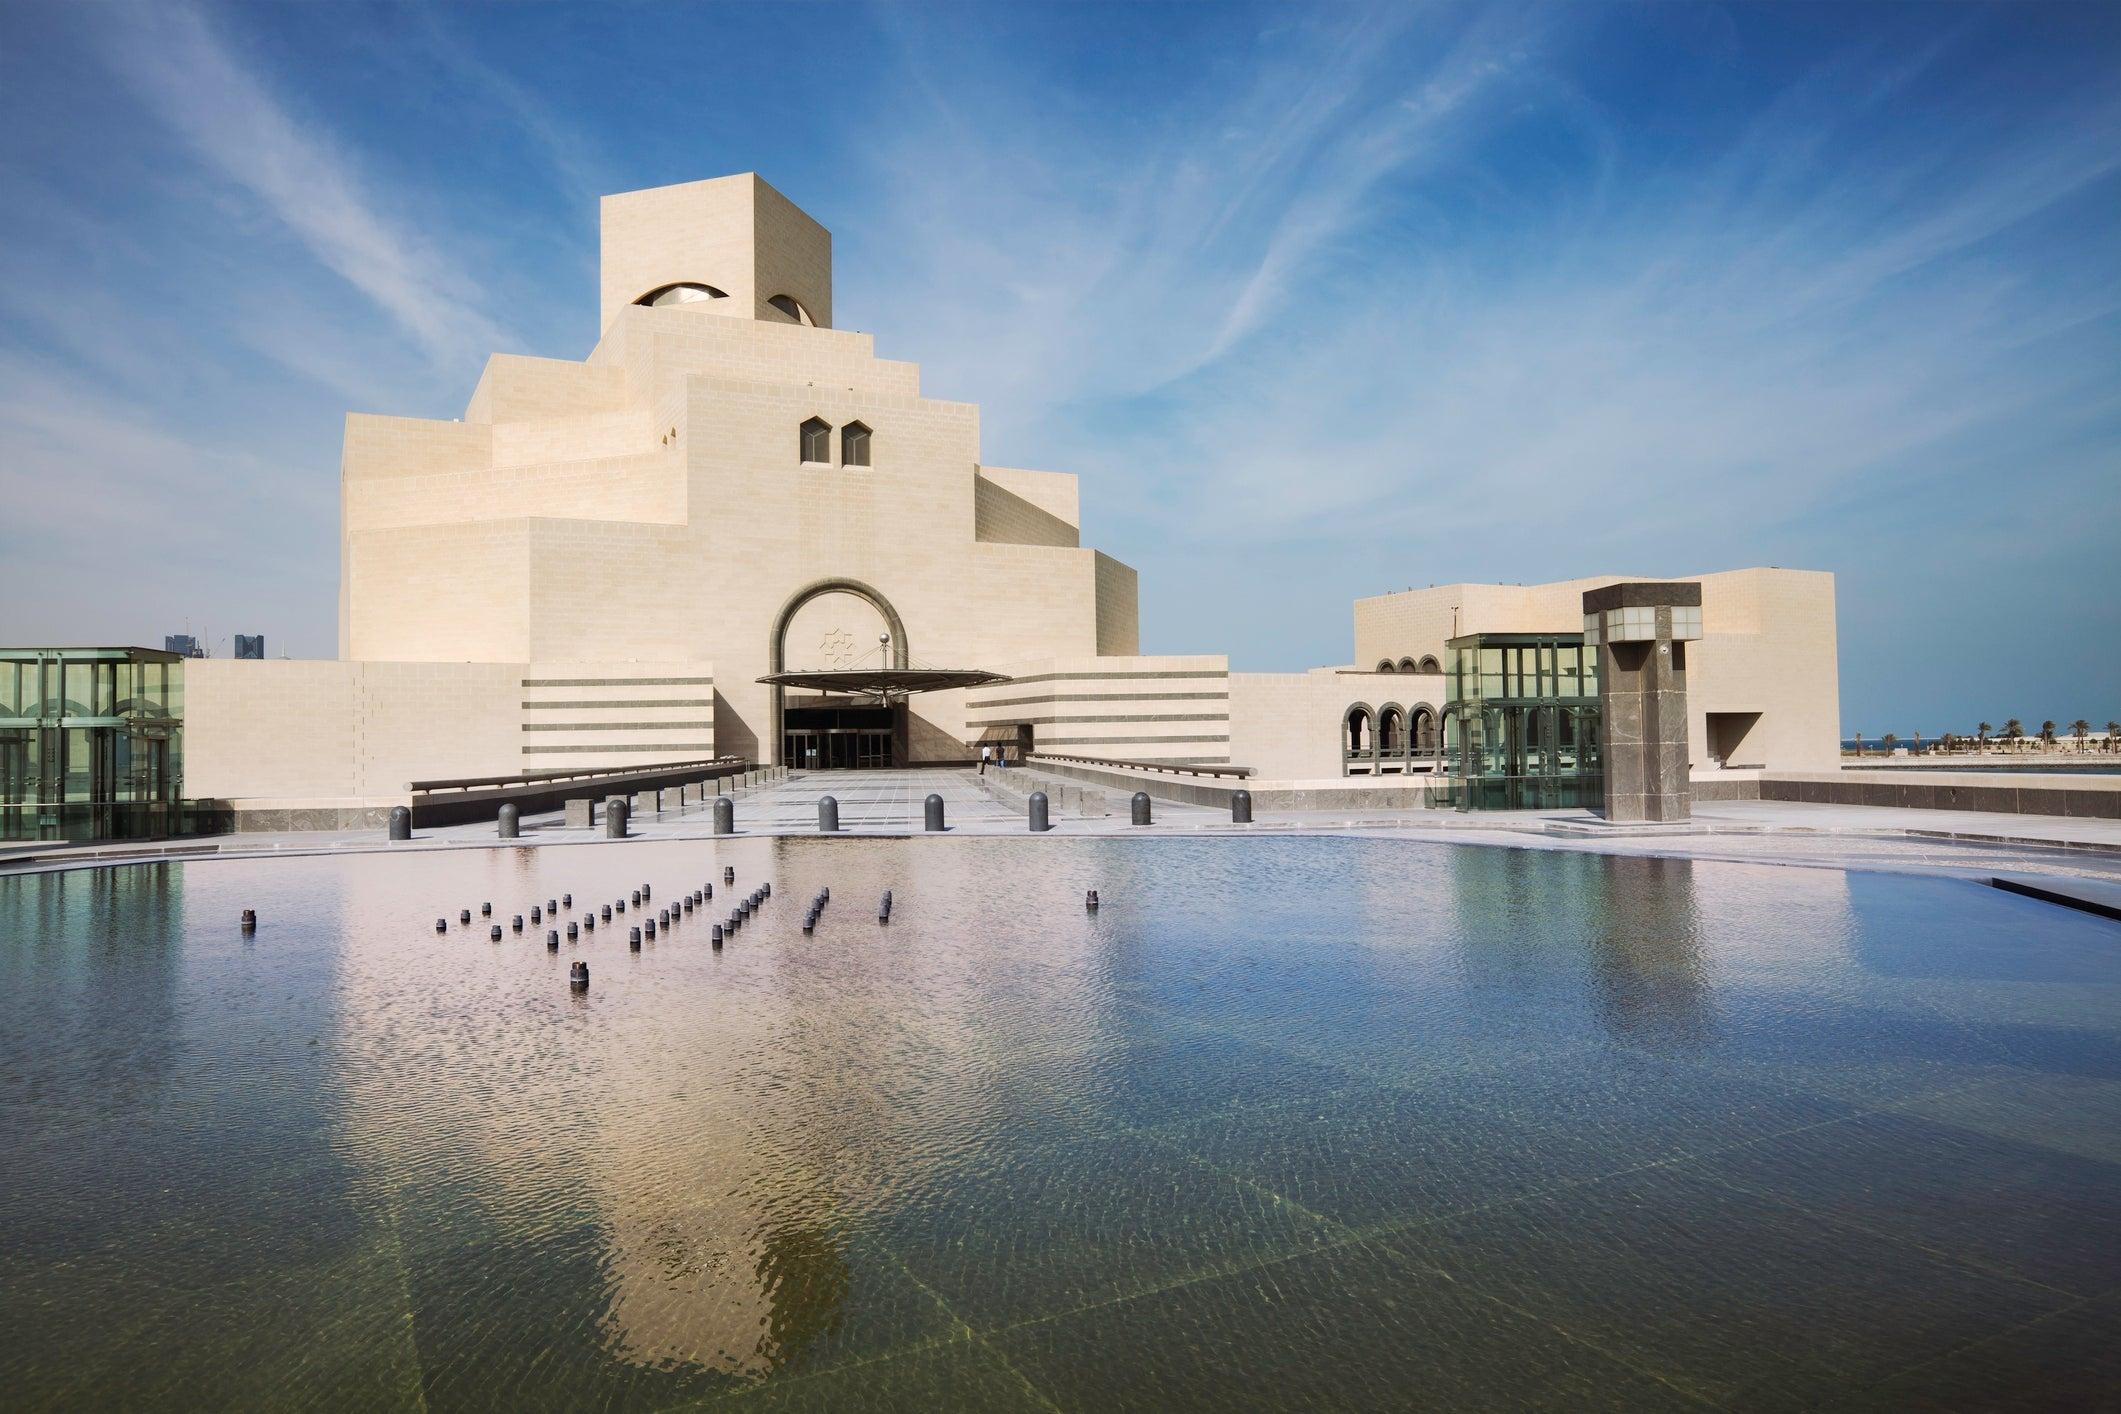 Doha, Qatar: Avant-garde architecture blooms in the desert